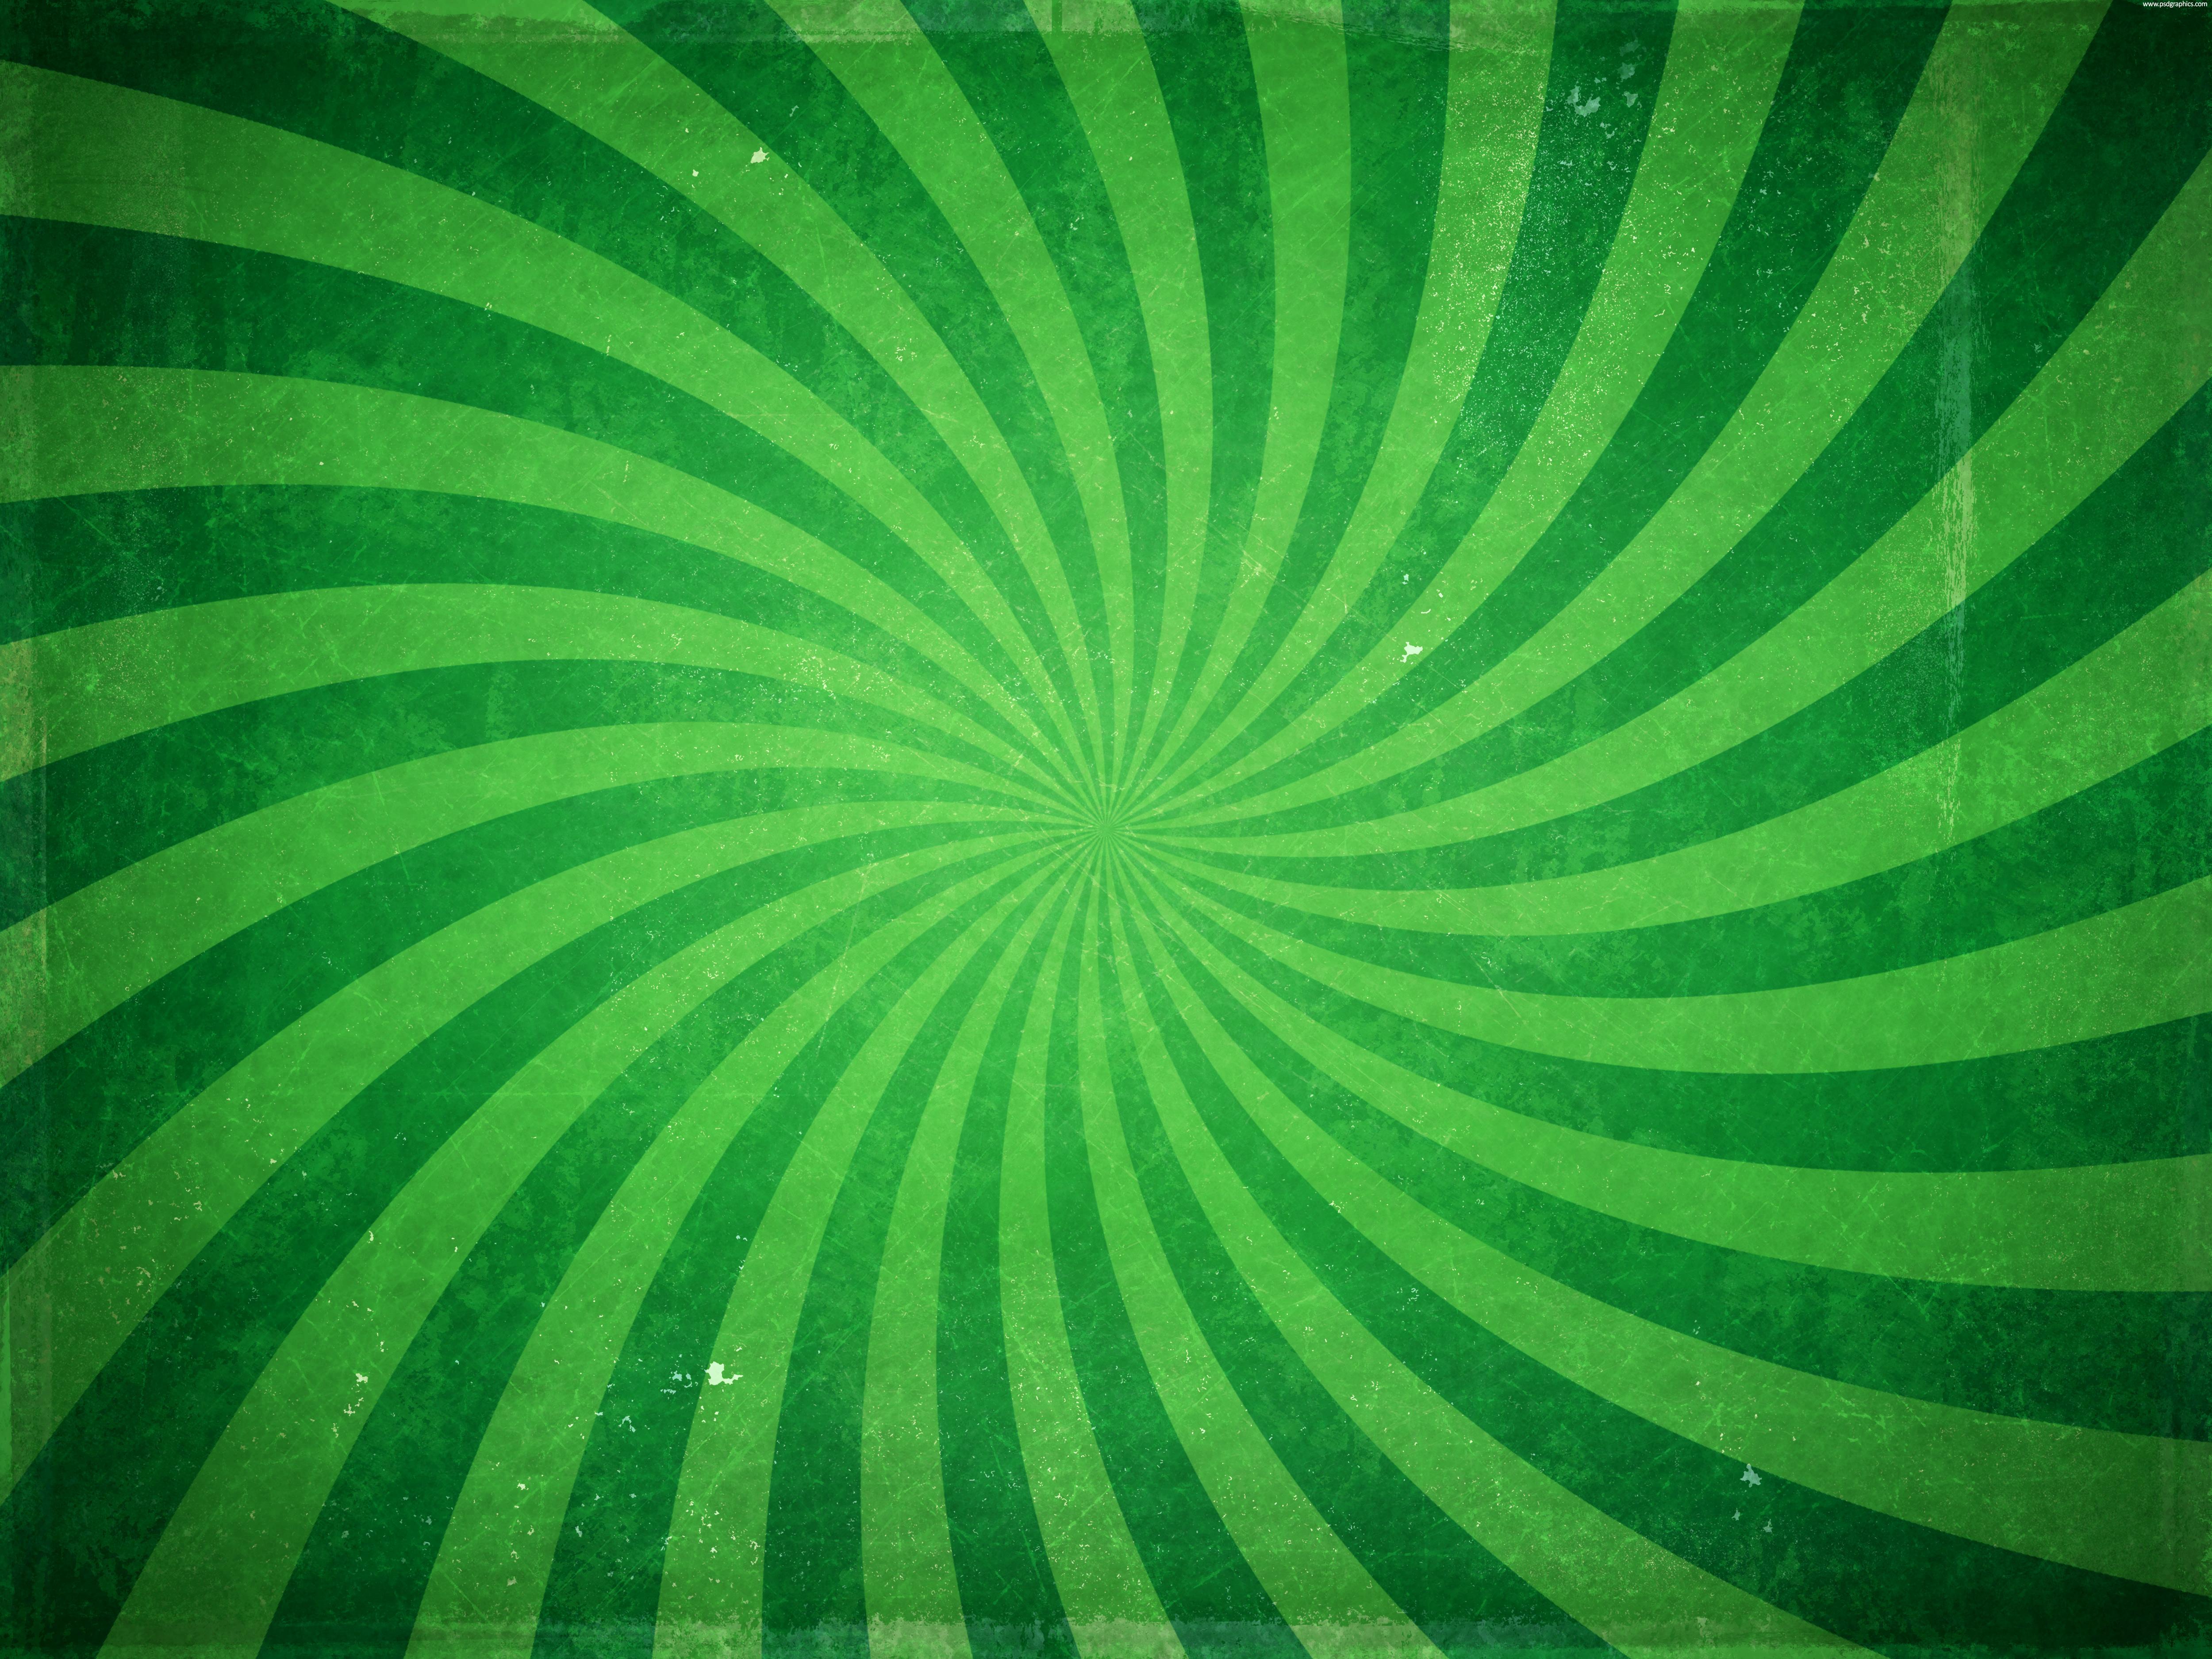 Green grungy twirl background PSDGraphics 5000x3750